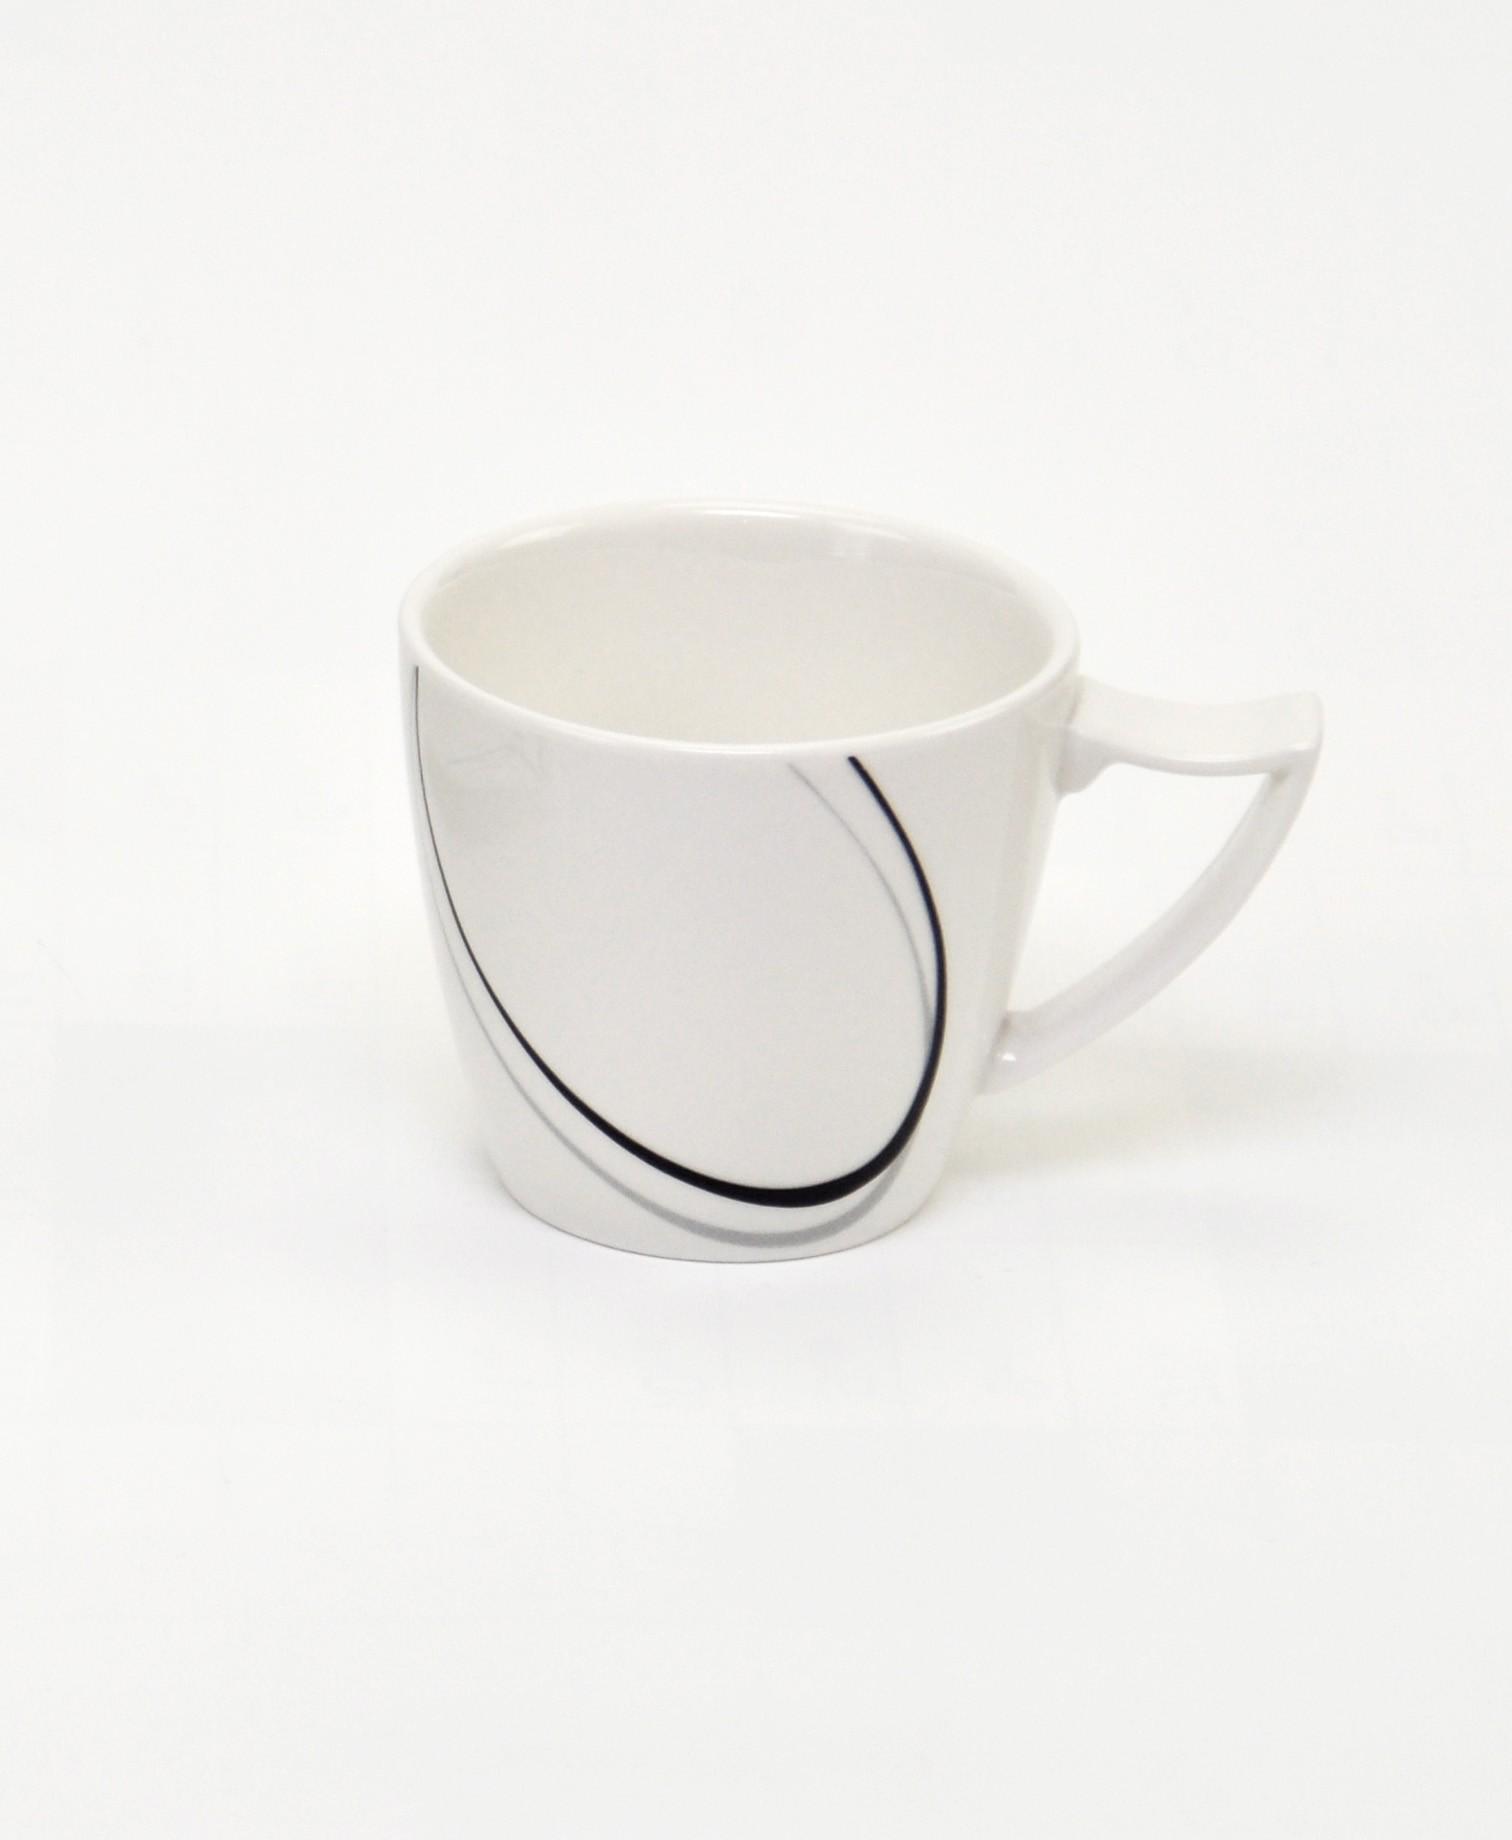 18tlg kaffeeservice scarlett 6 personen porzellan. Black Bedroom Furniture Sets. Home Design Ideas